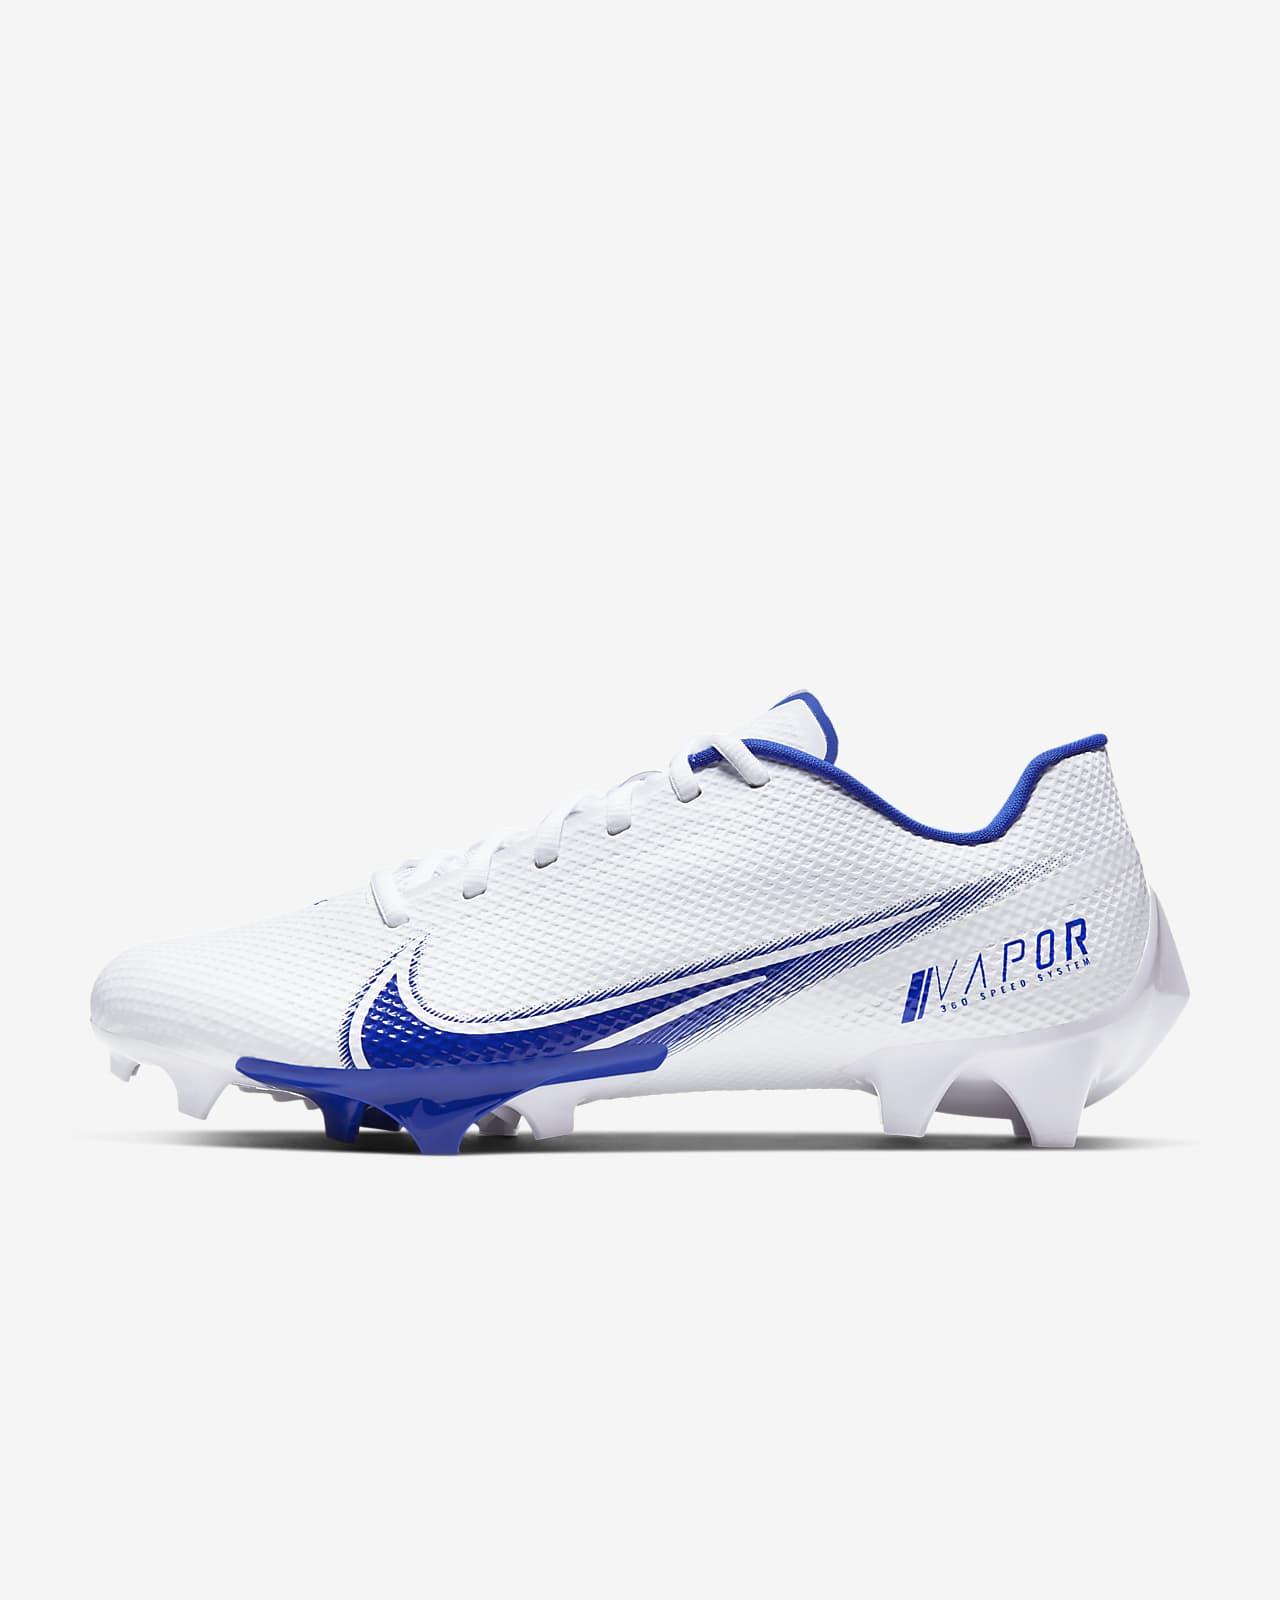 Nike Vapor Edge Speed 360 Men S Football Cleat Nike Com